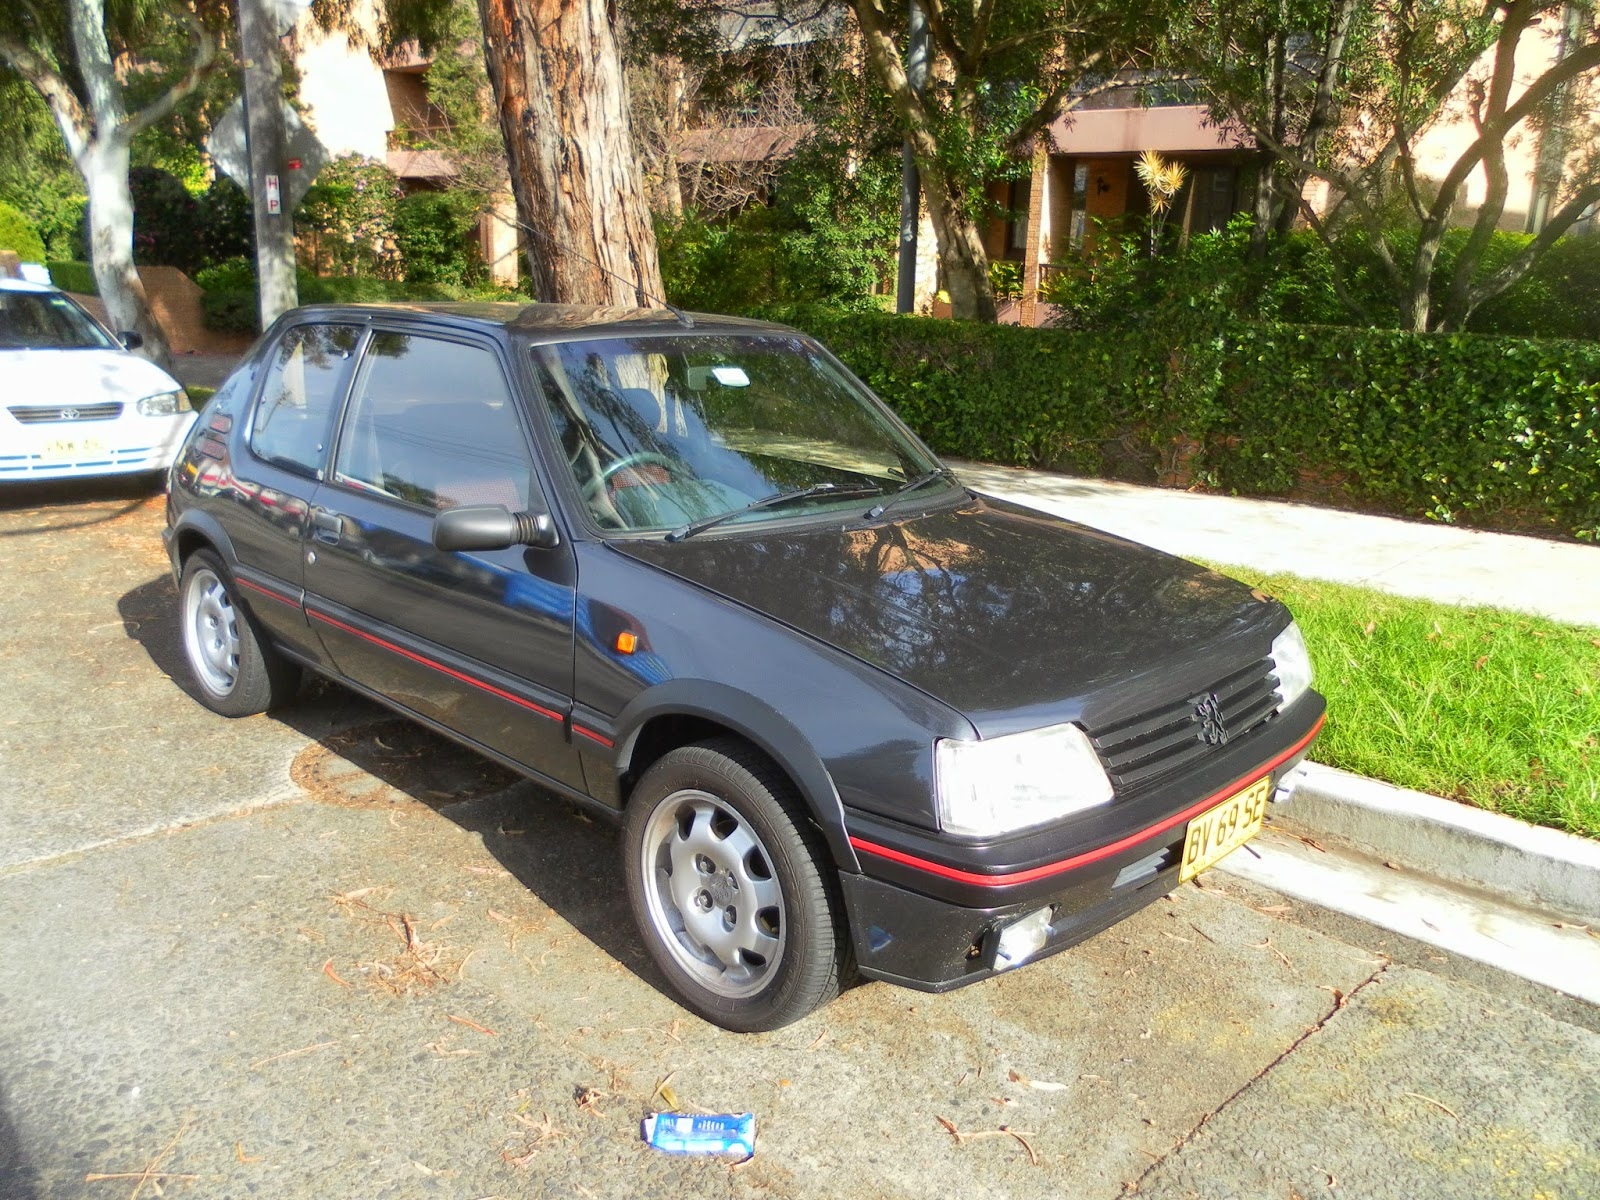 aussie old parked cars 1990 peugeot 205 gti 1 9. Black Bedroom Furniture Sets. Home Design Ideas